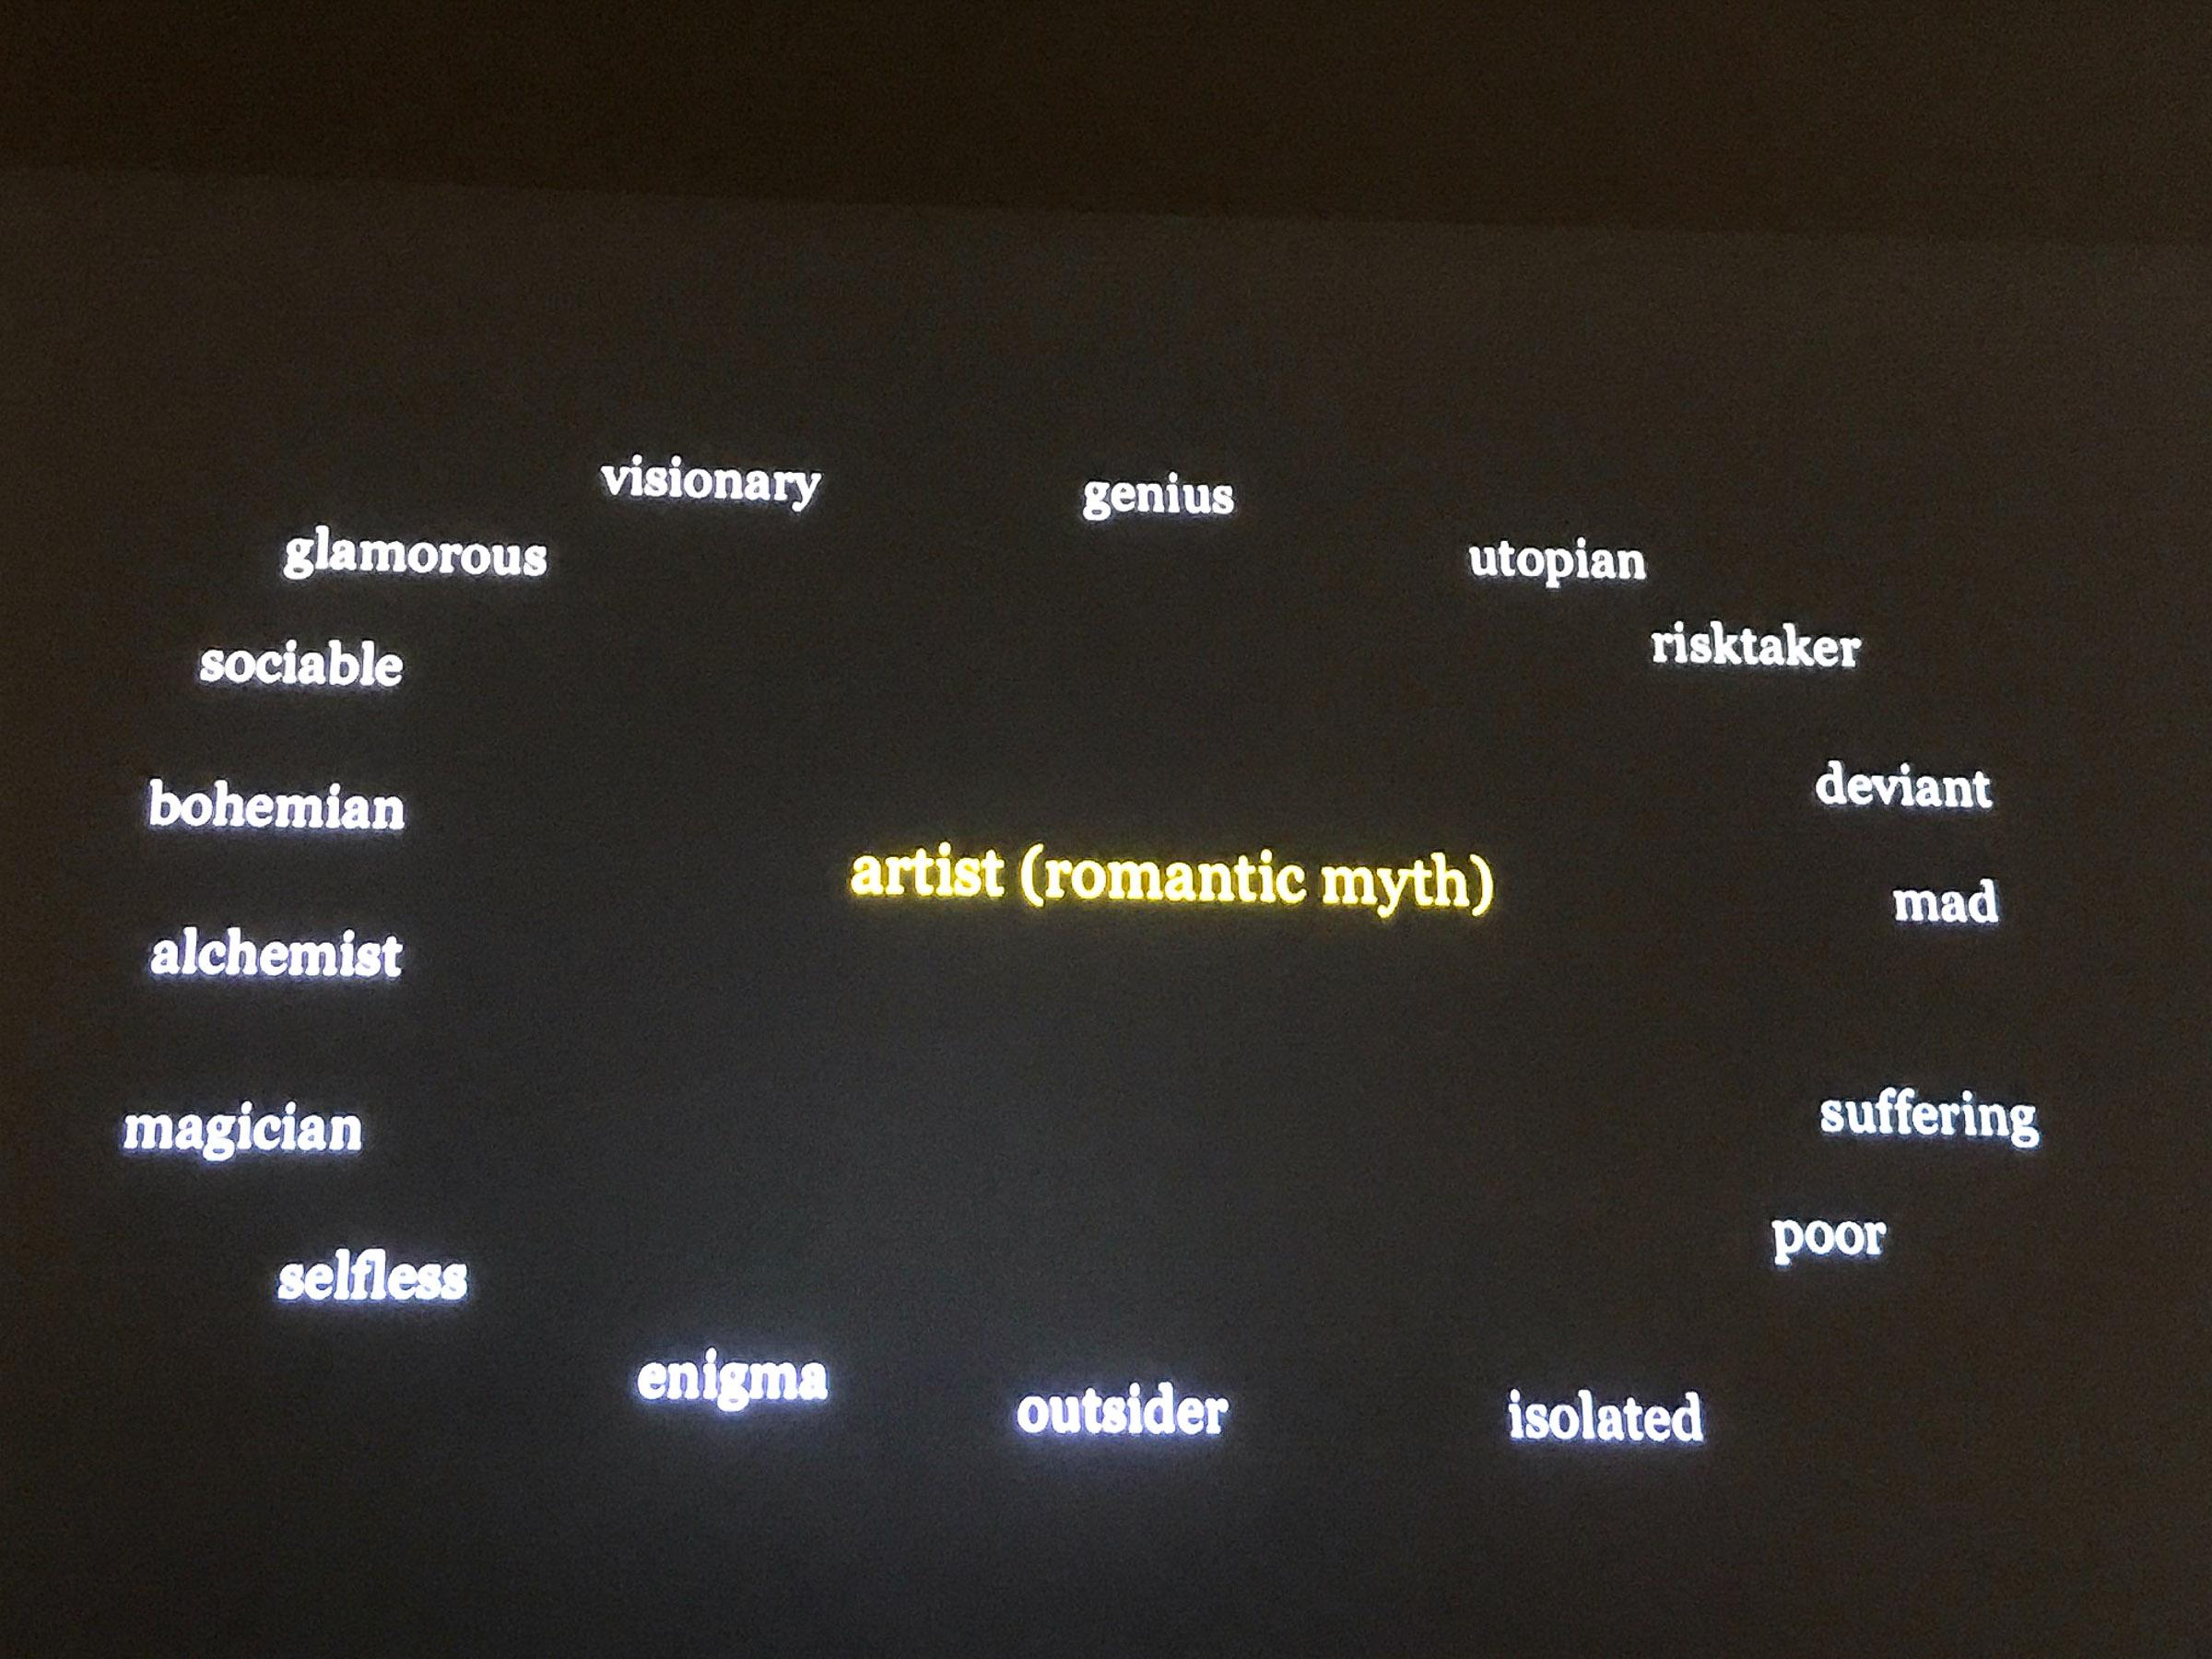 Slide (artist [romantic myth])(2400px)